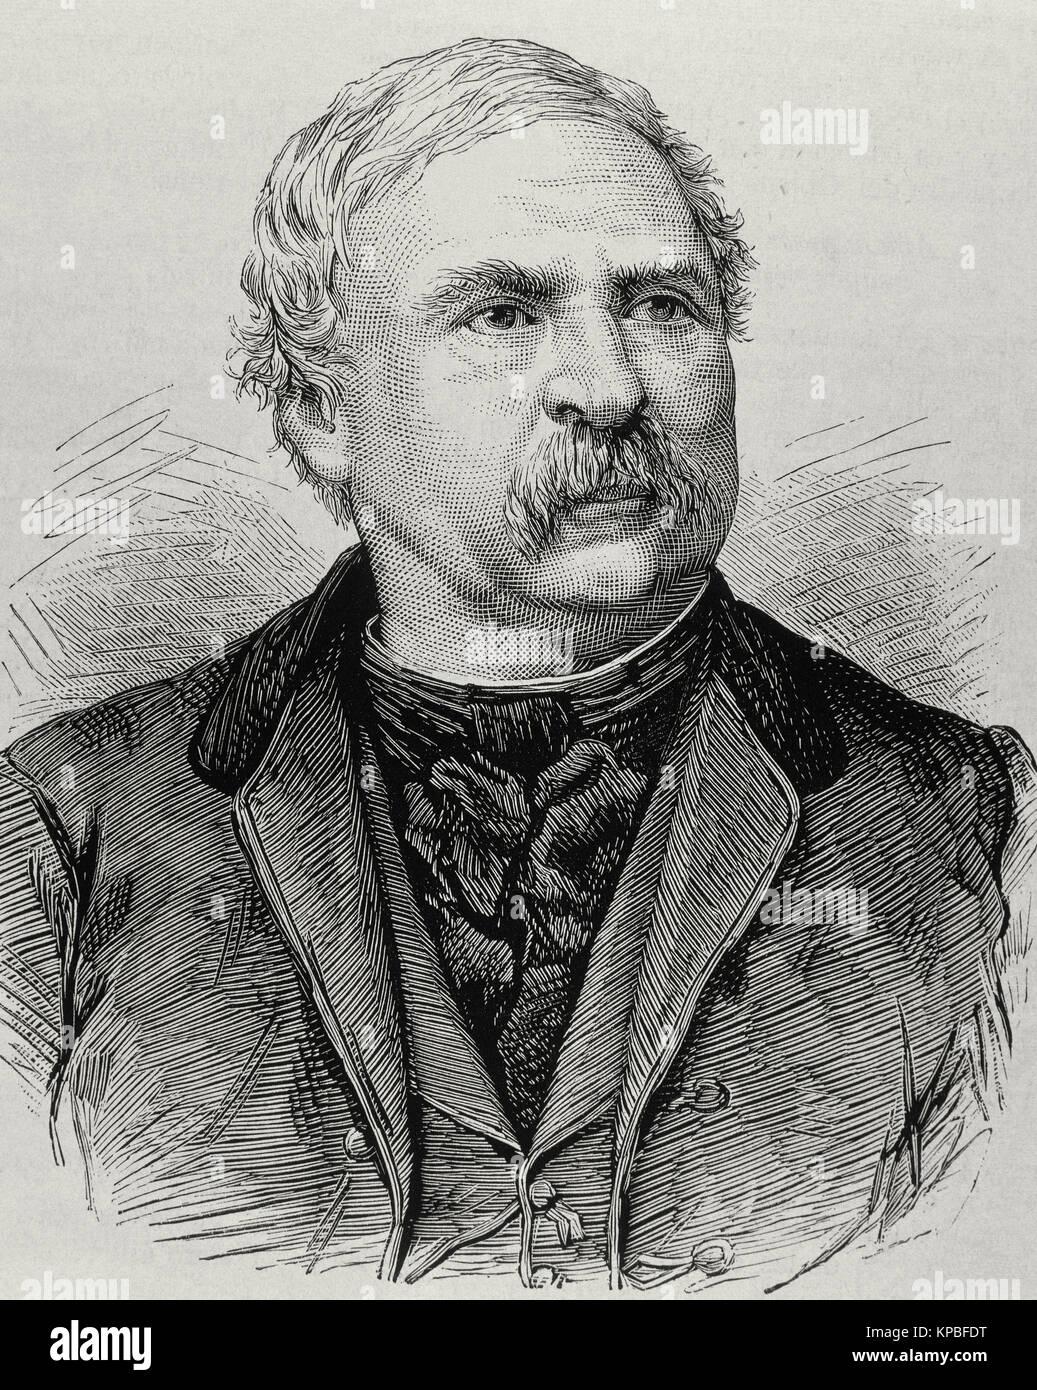 Ferenc Deak (1803-1876). Hungarian politician. Portrait. Engraving - Stock Image